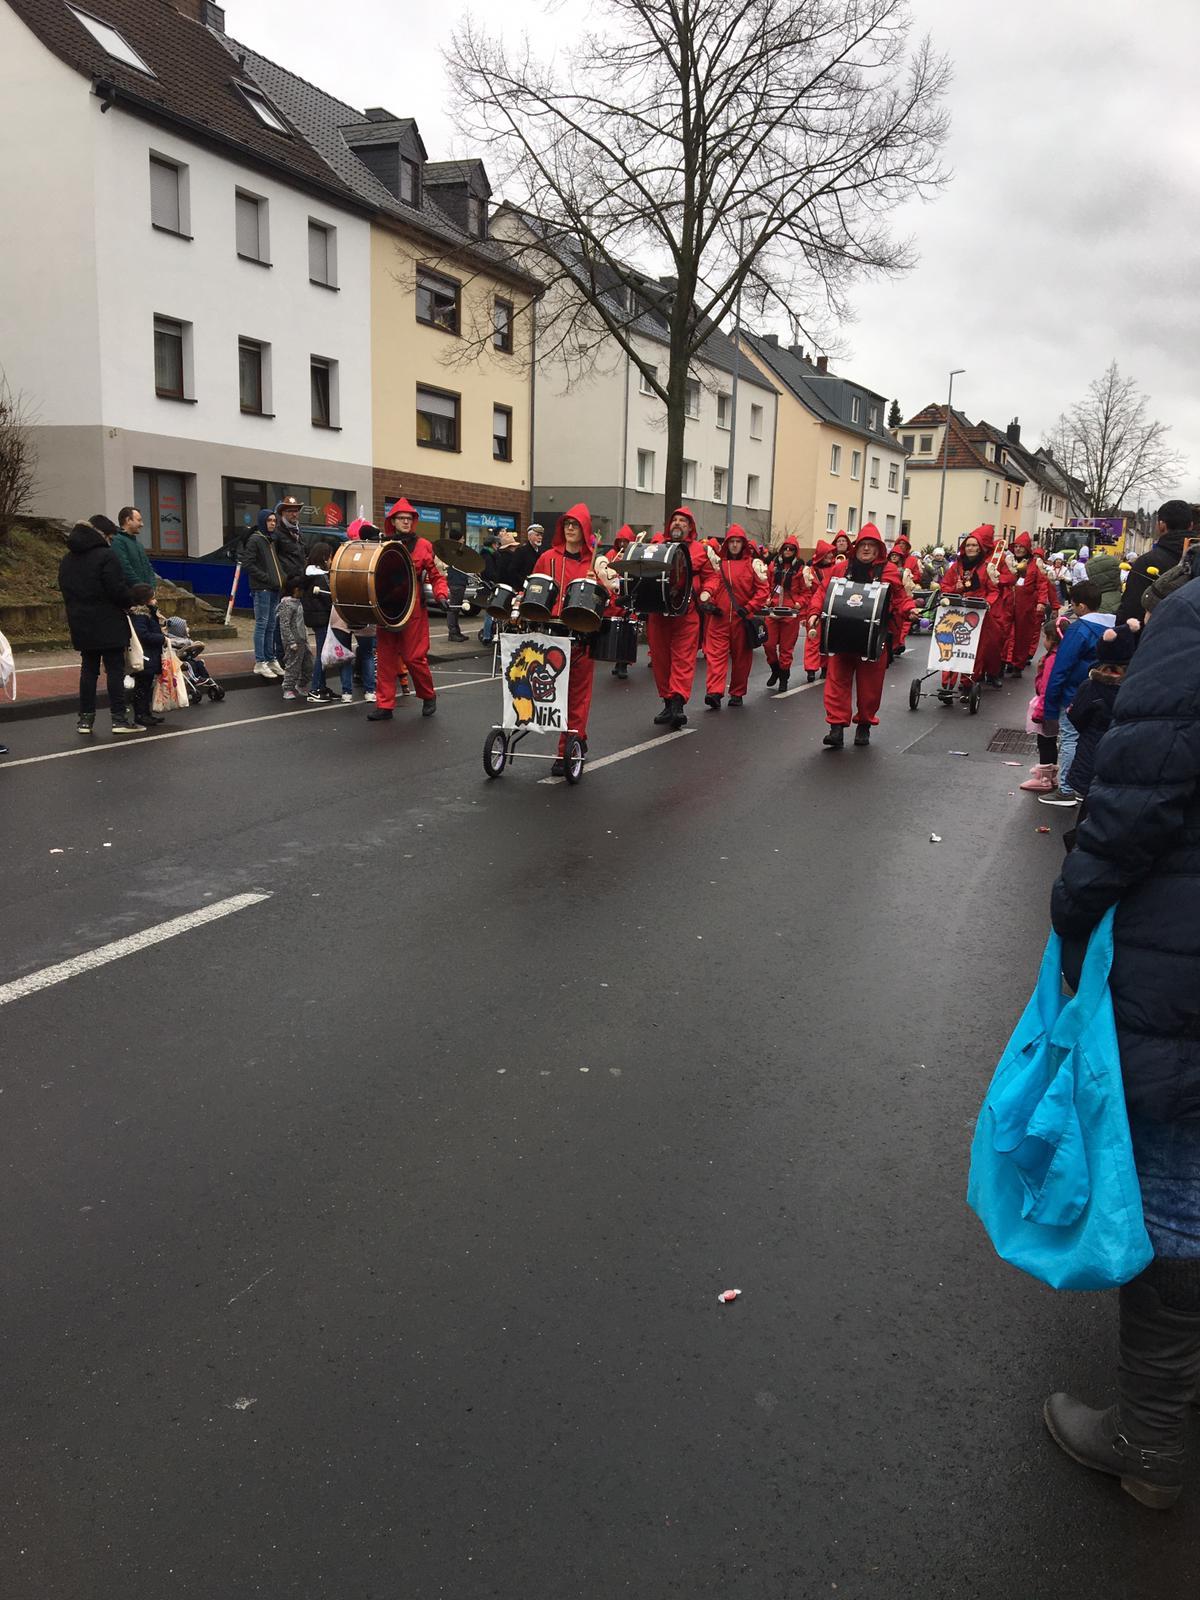 NoName-Guggen-Andernach-2020-Karneval-97